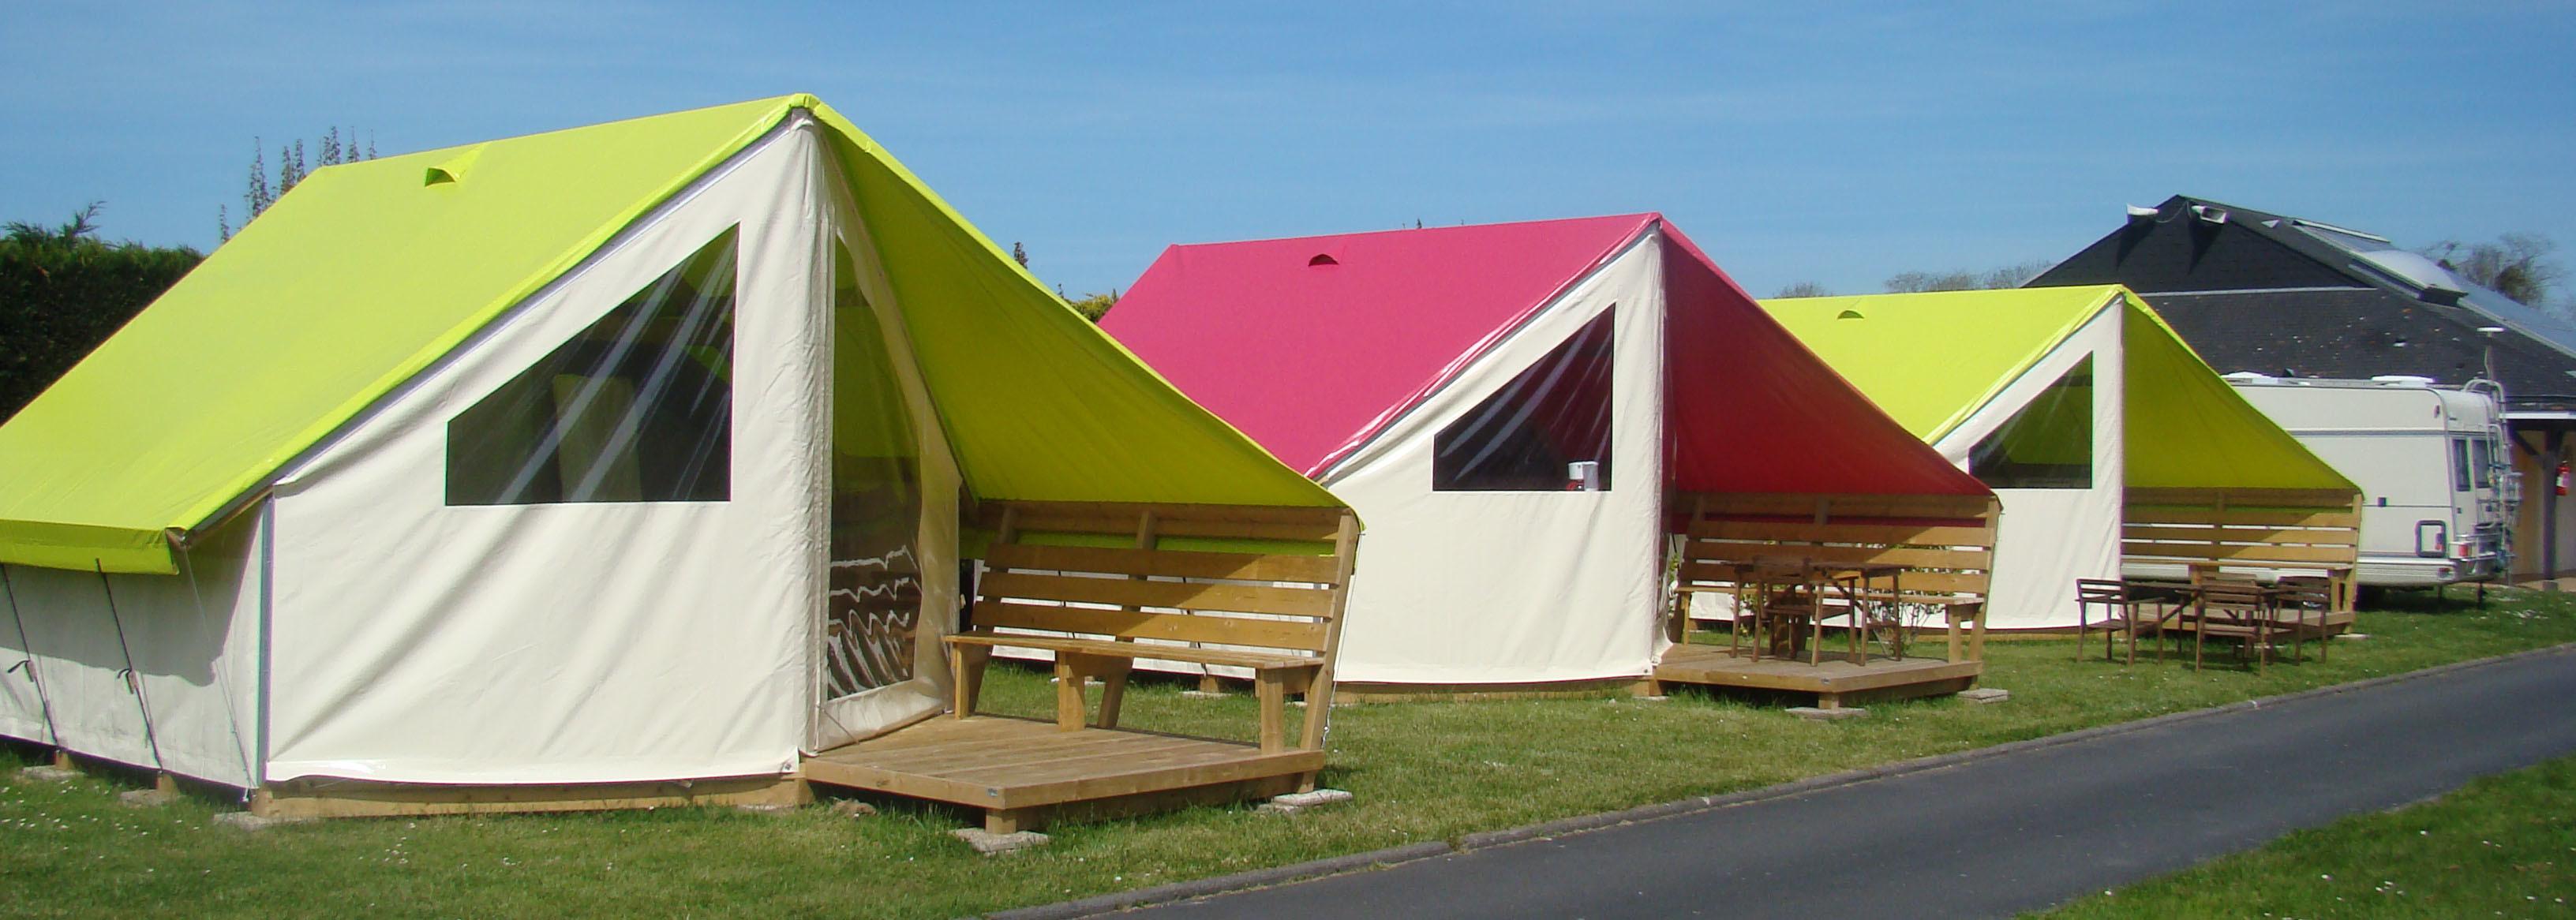 Lodges-camping-le-Rivabella-Ouistreham